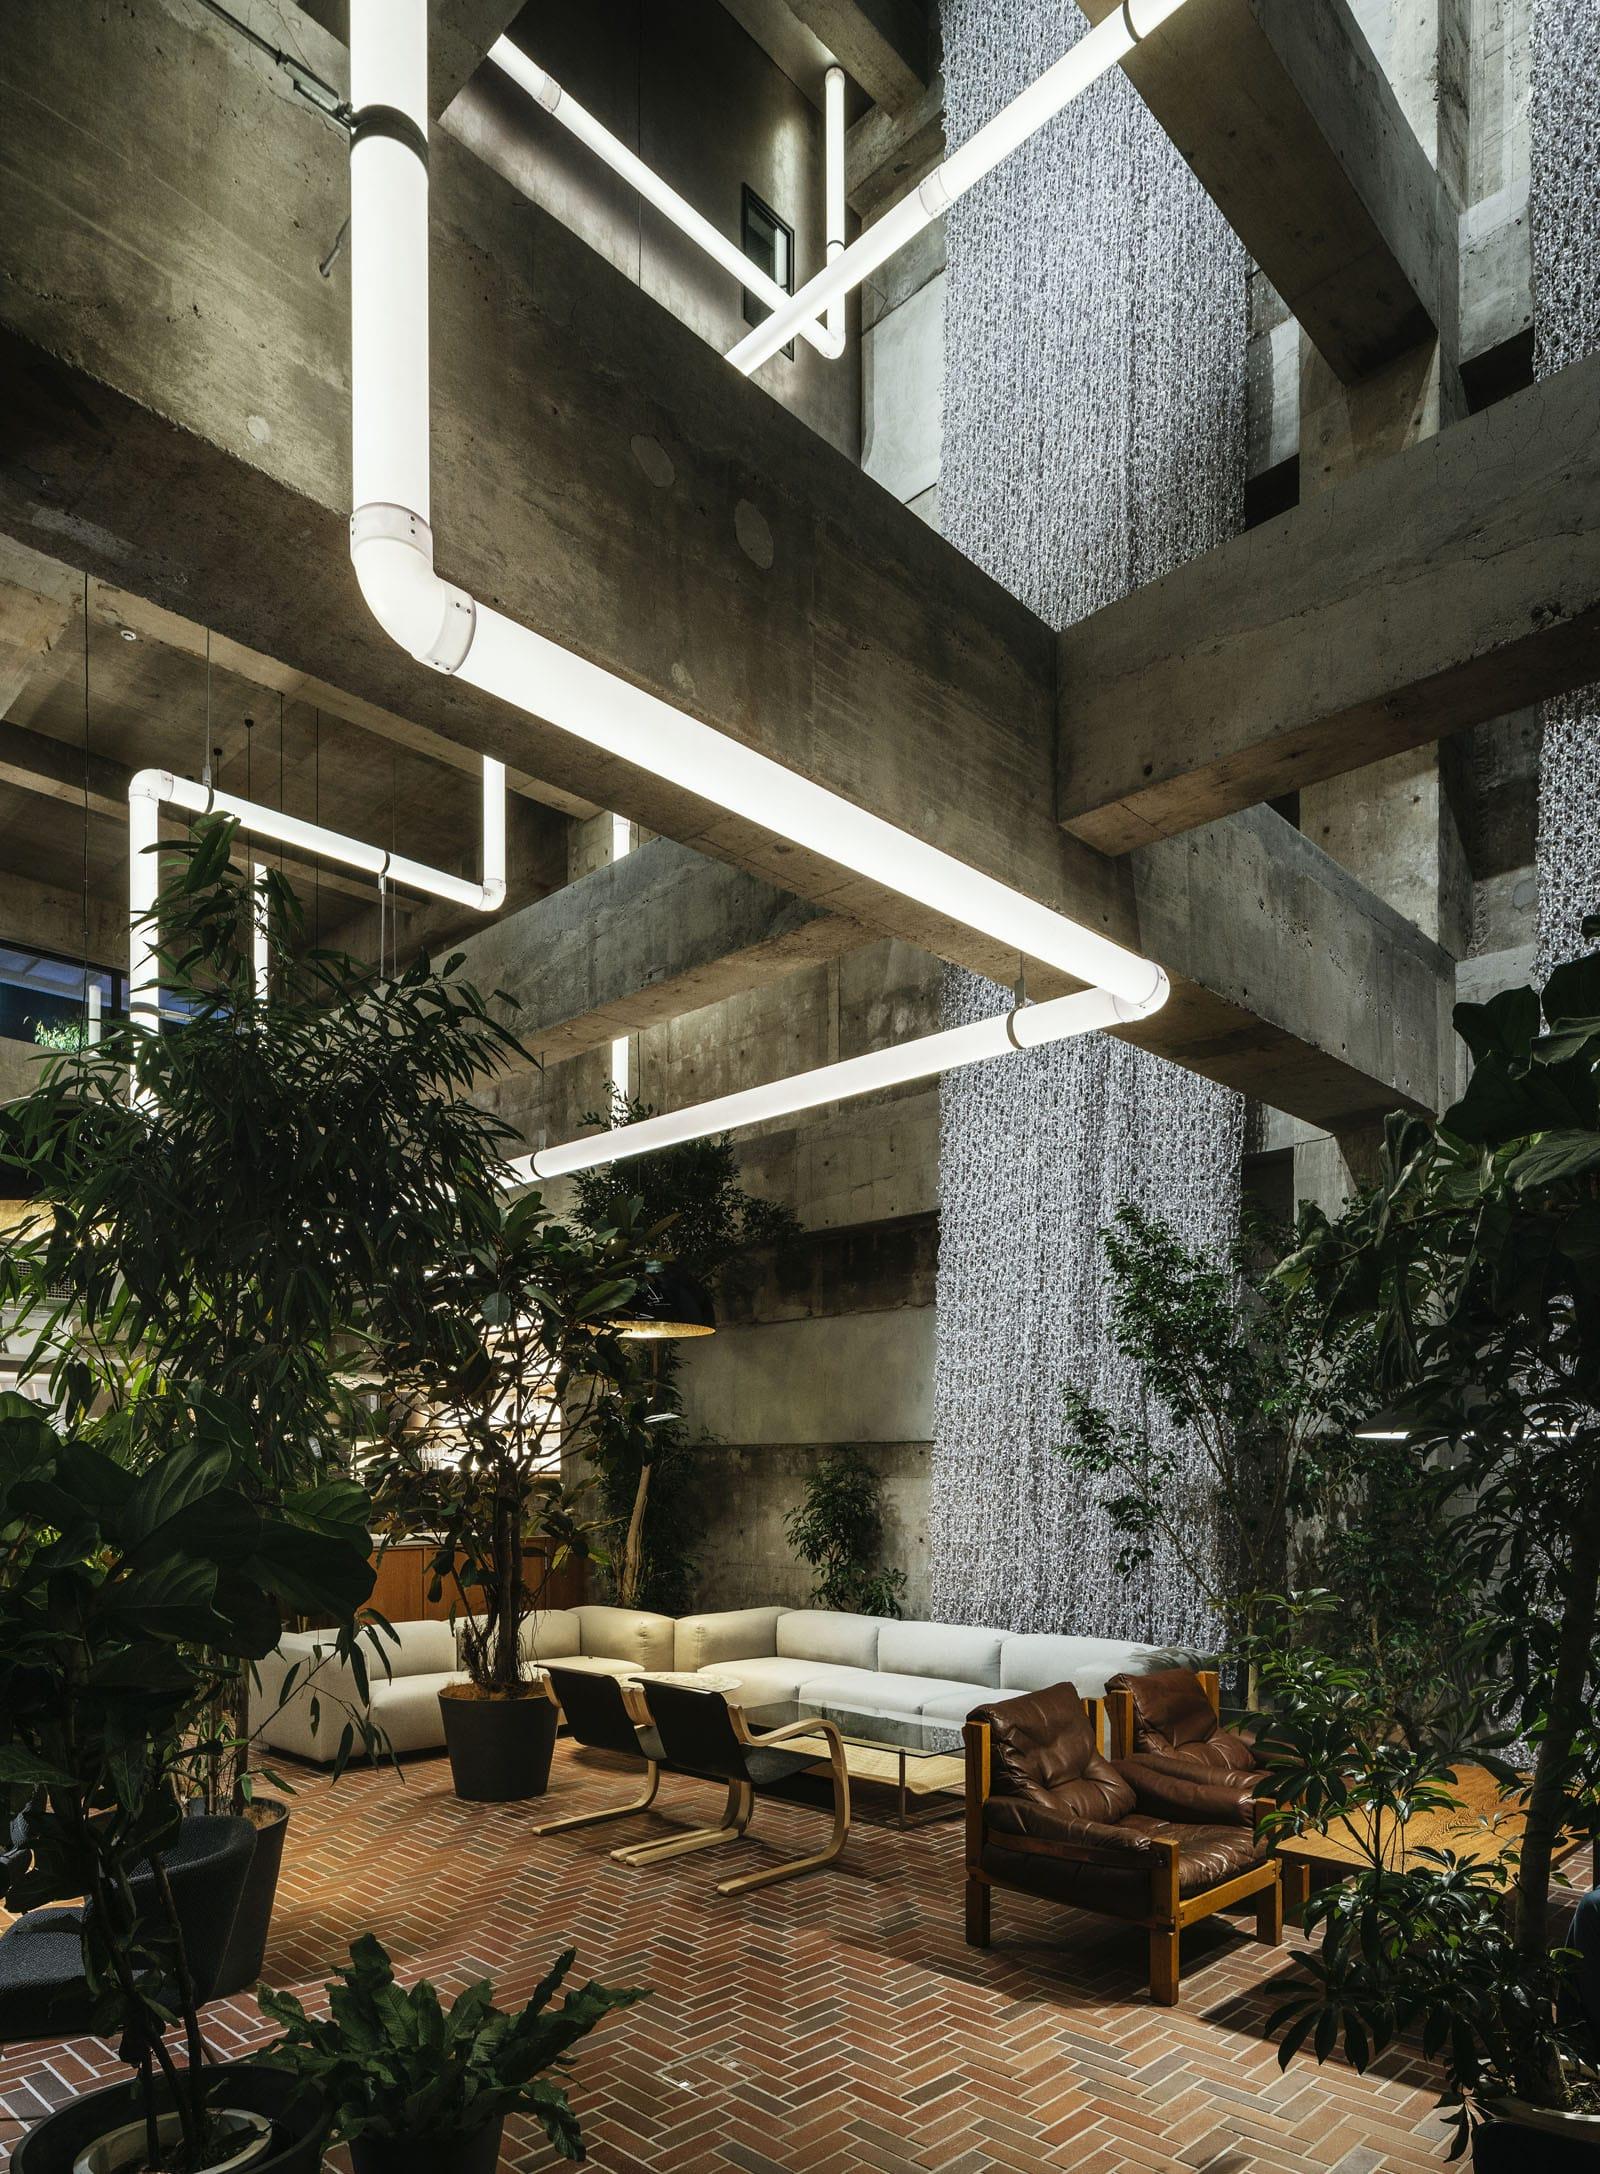 Shiroiya Hotel  - 20210816 SouFujimoto ShiroiyaHotel 07.1 45